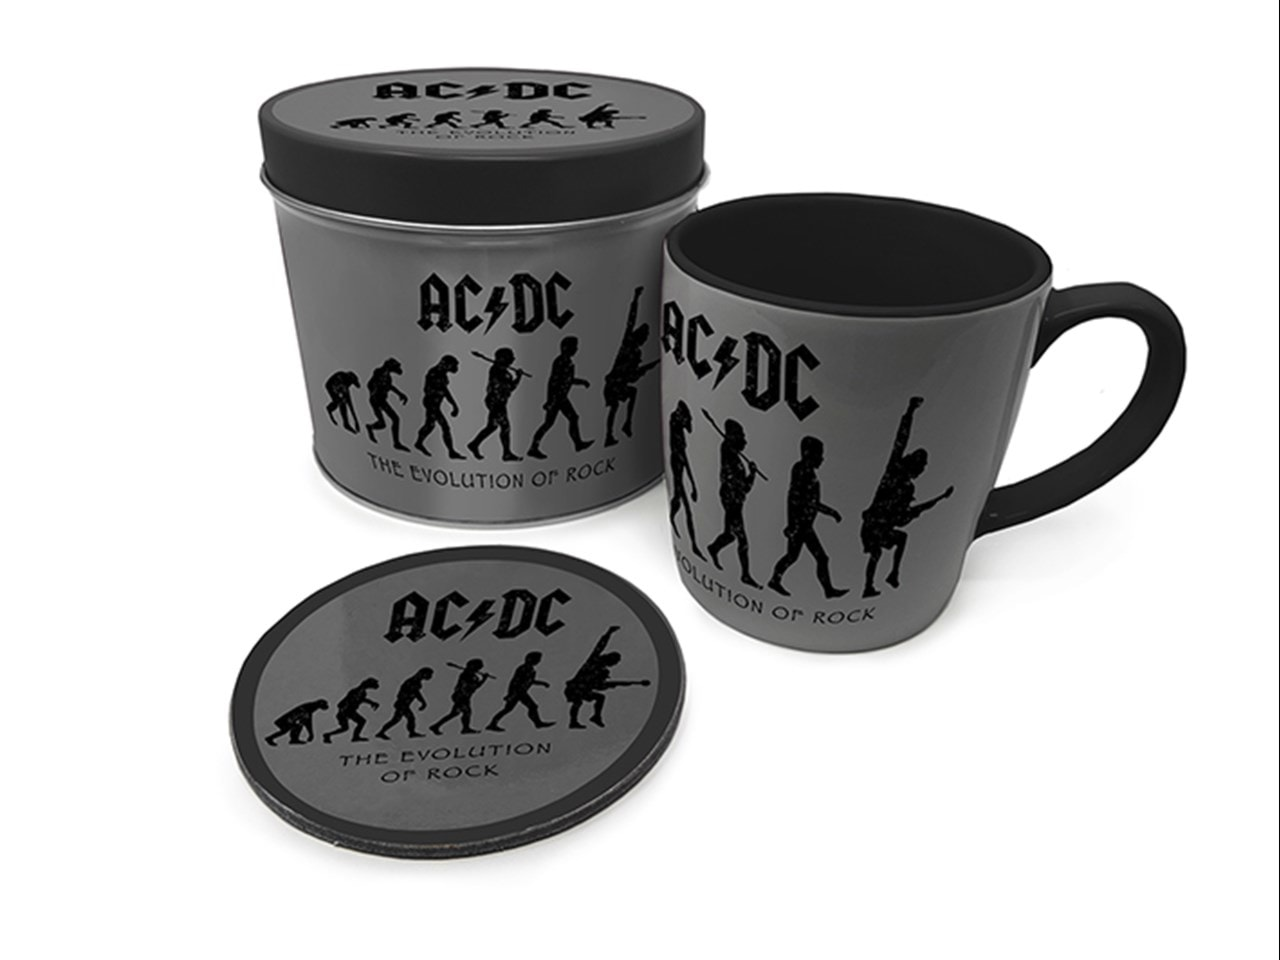 AC/DC: Evolution Of Rock Mug Gift Set in Tin - 1